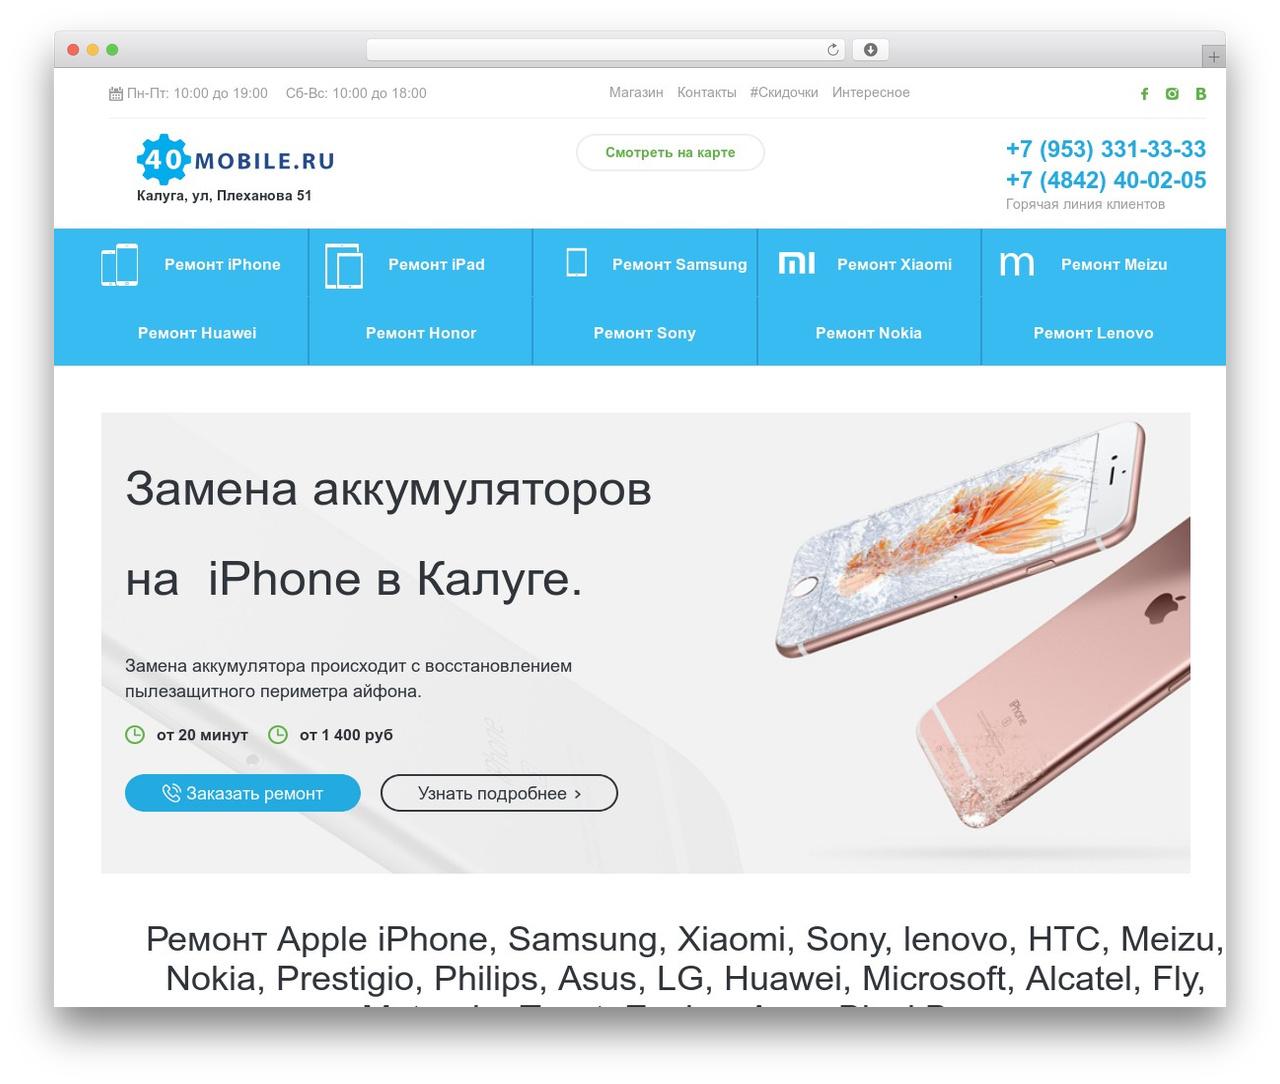 Apple-remont */ theme WordPress - 40mobile.ru